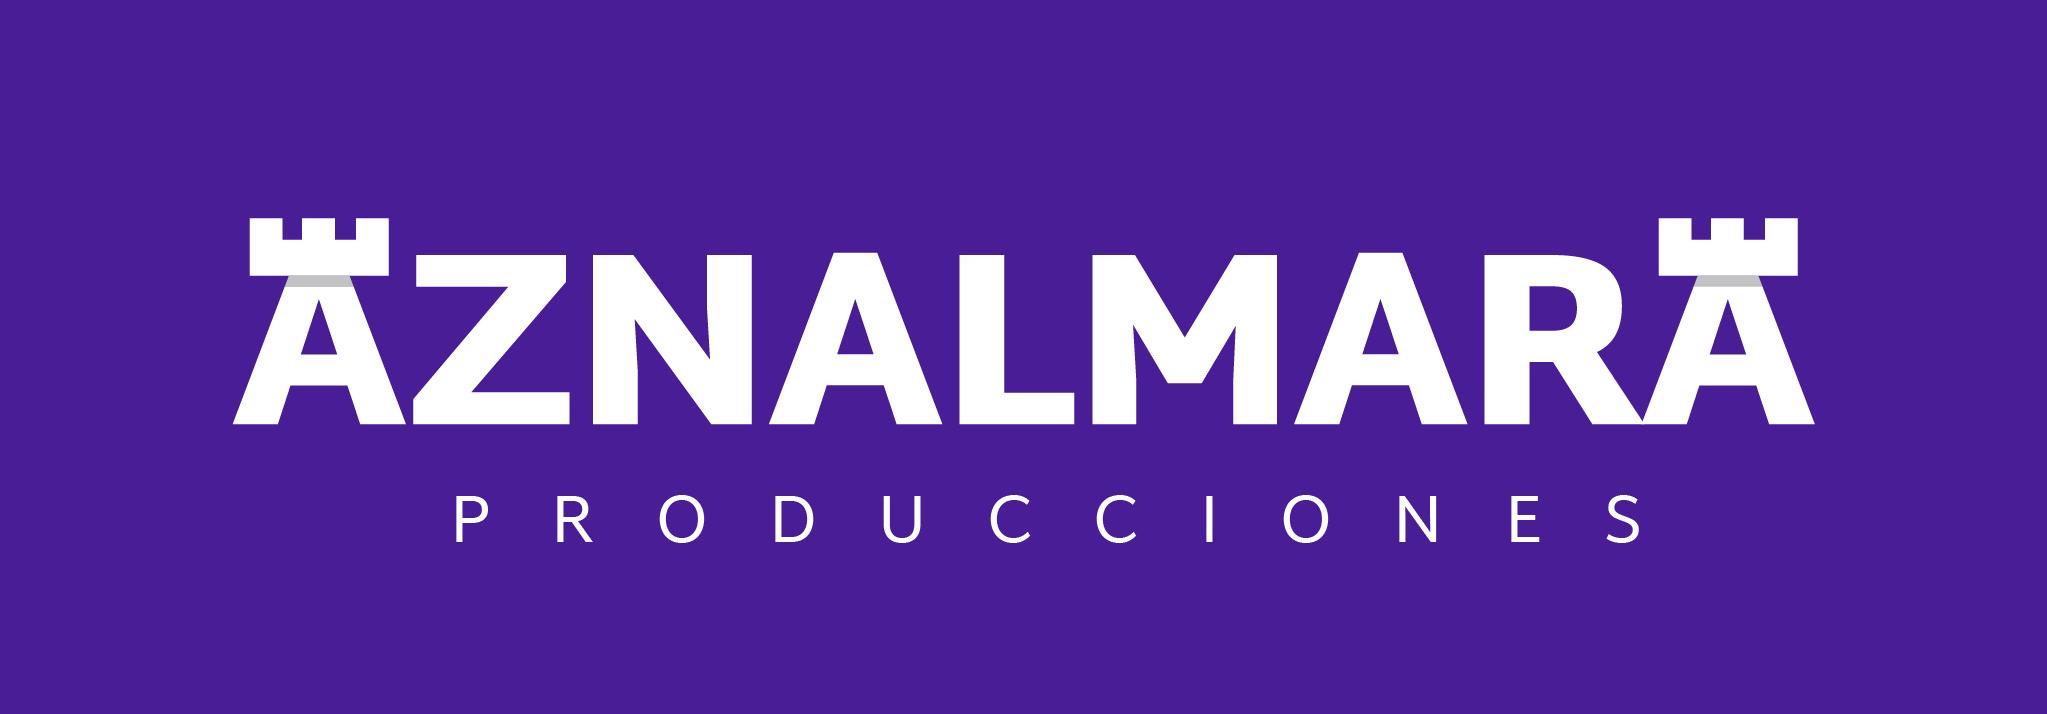 LOGO_AZNALMARA®_PRODUCCIONES_BLANCO_FONDO_MORADO